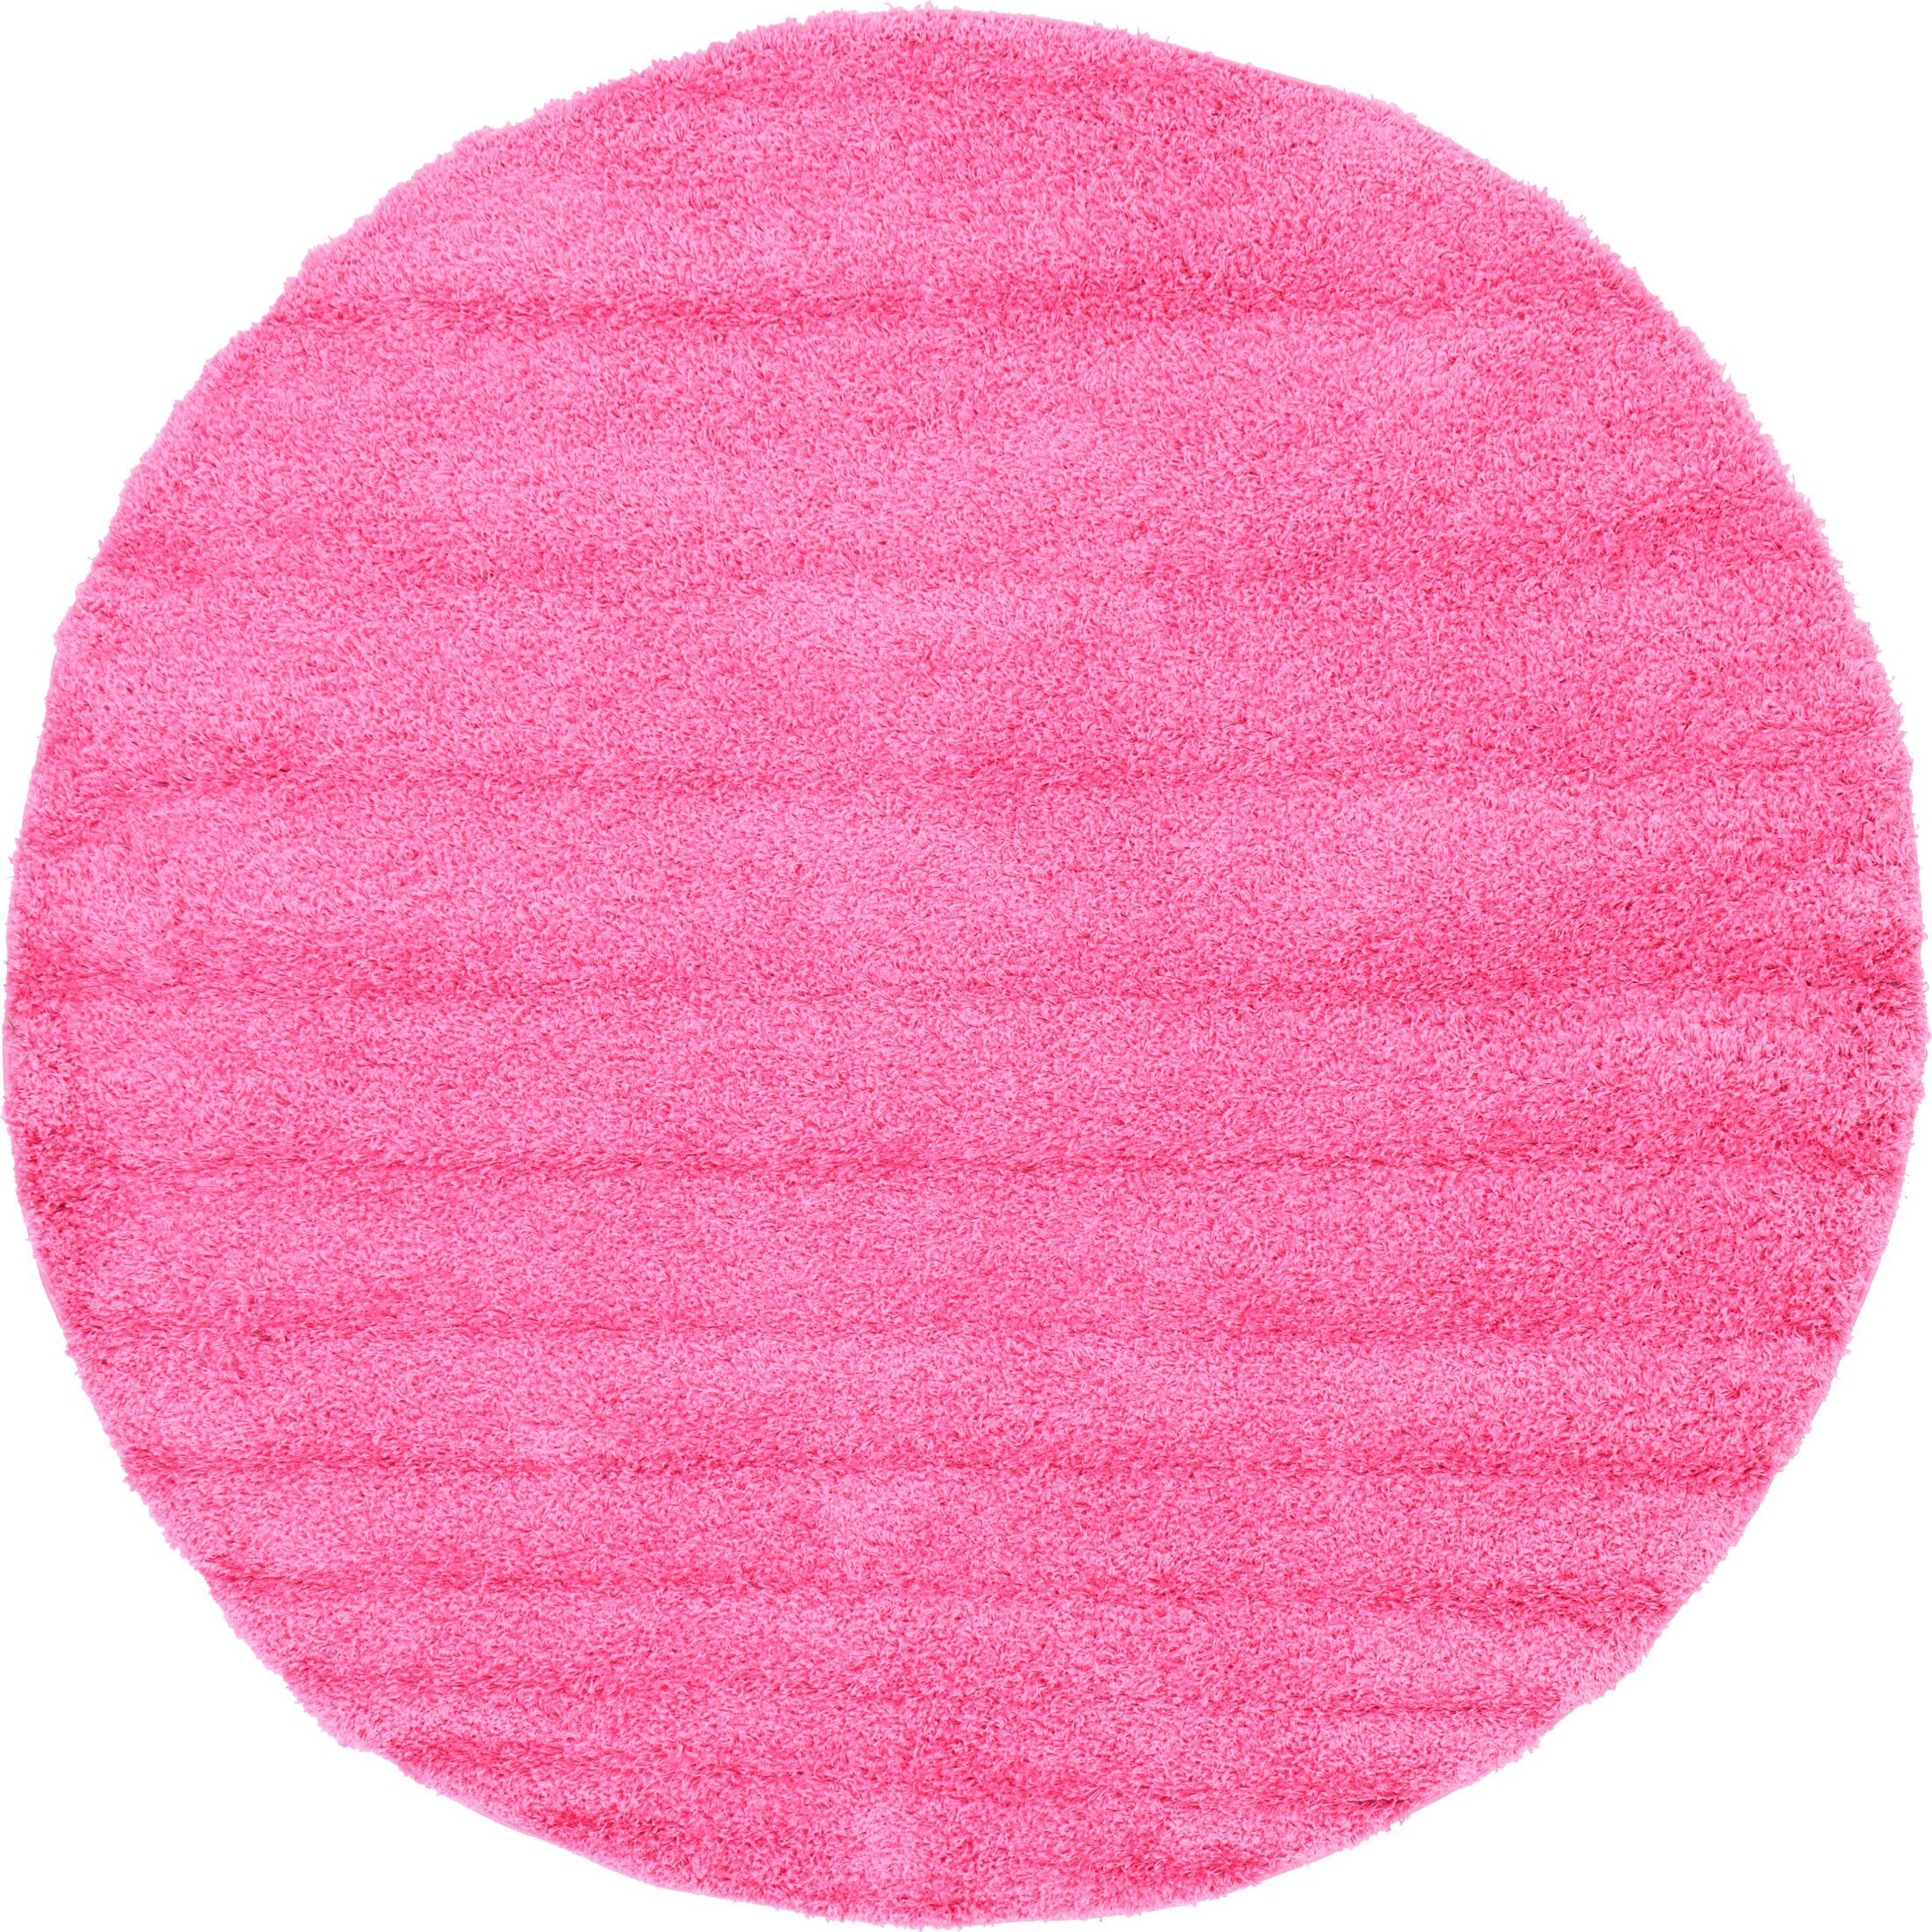 Madison Pink Area Rug Rug Size: Round 8'2